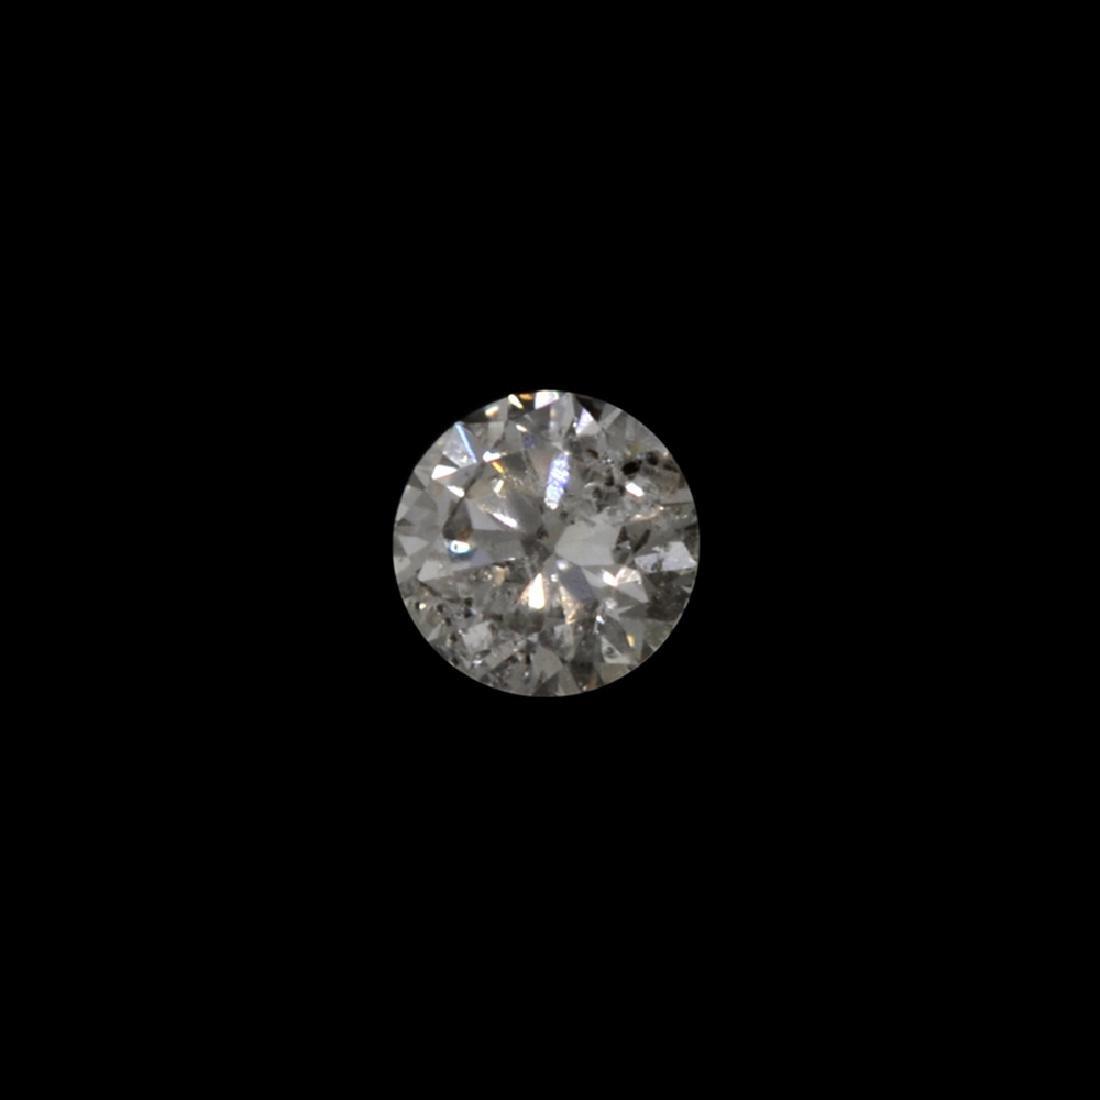 Fine Jewelry GIA Certified 0.25CT Round Brilliant Cut